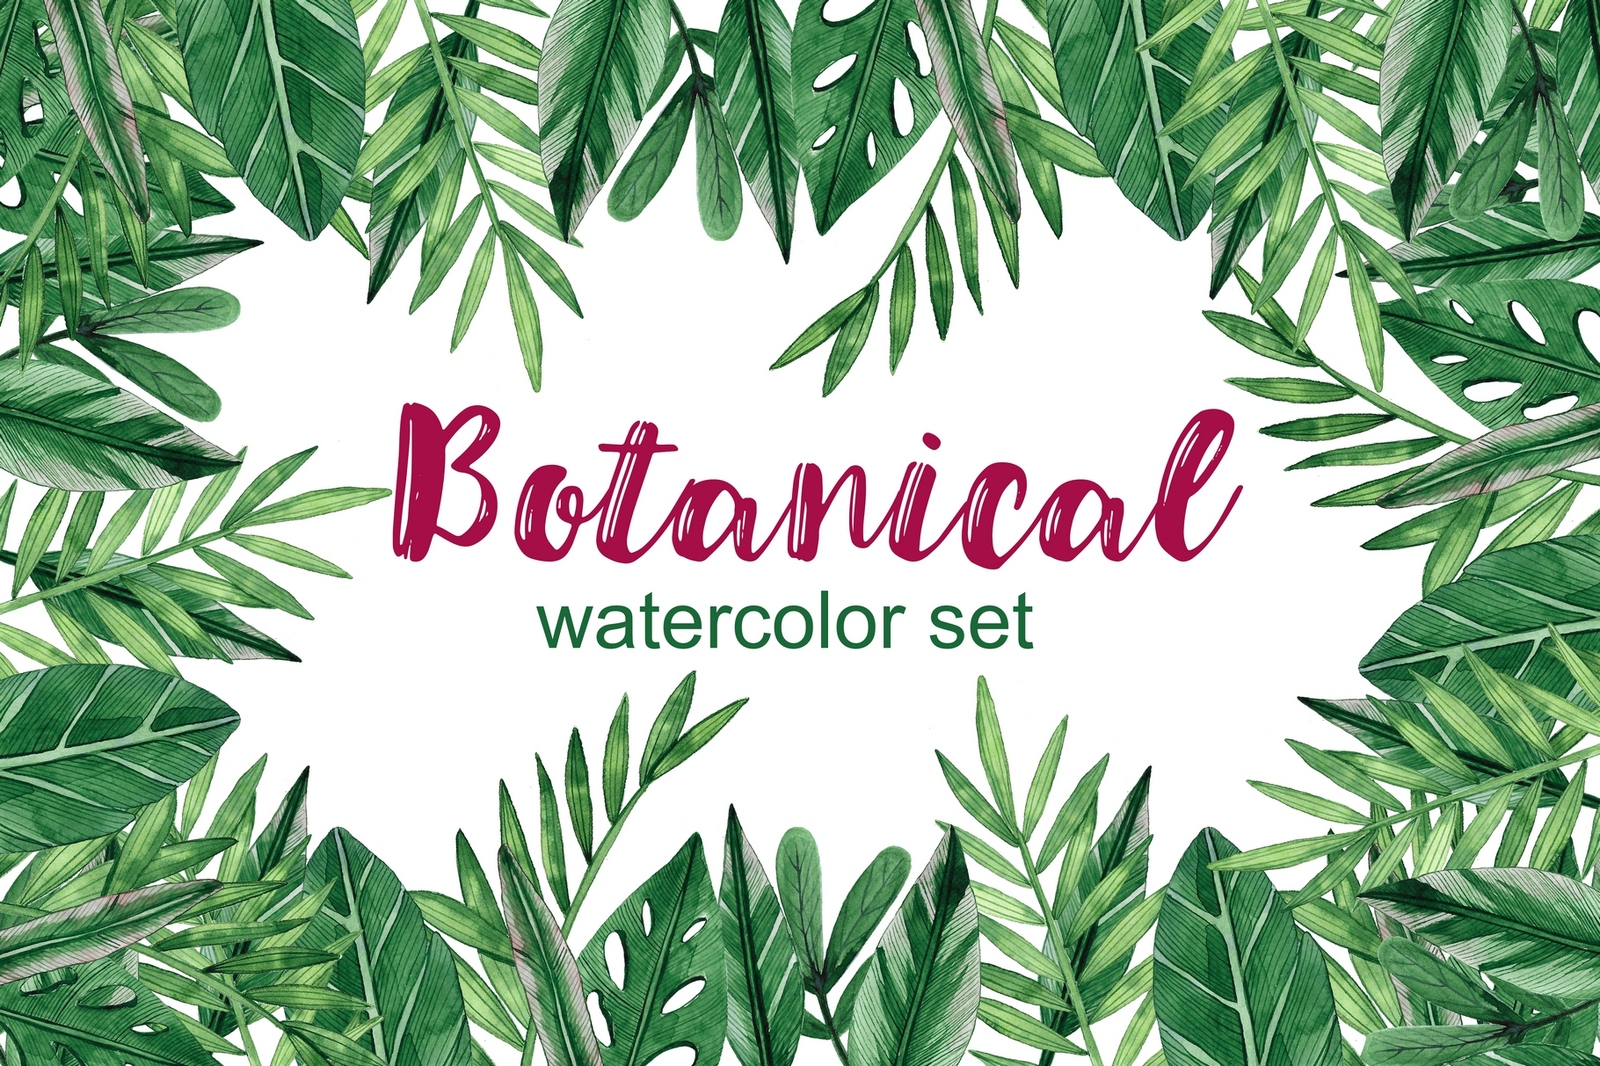 Botanical Watercolor Set